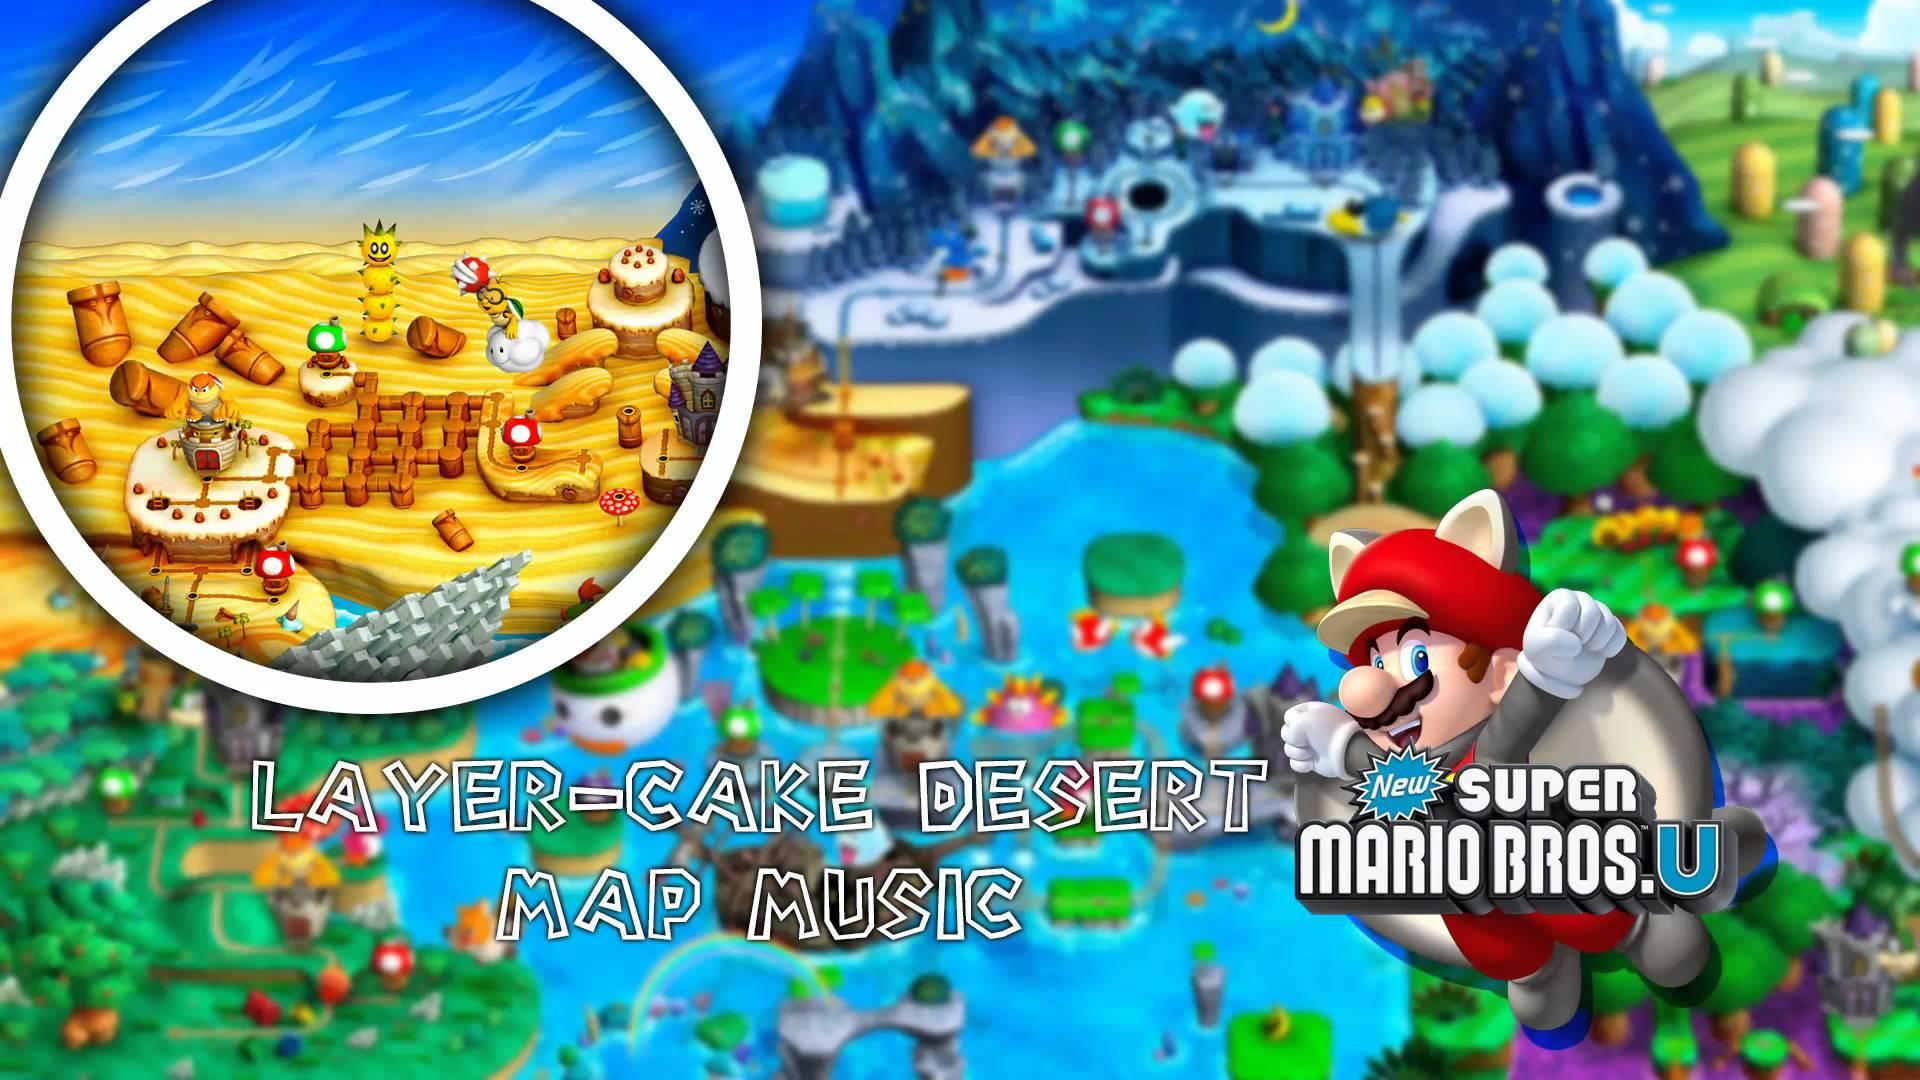 New Super Mario Bros U Wallpapers Video Game Hq New Super Mario Bros U Pictures 4k Wallpapers 2019